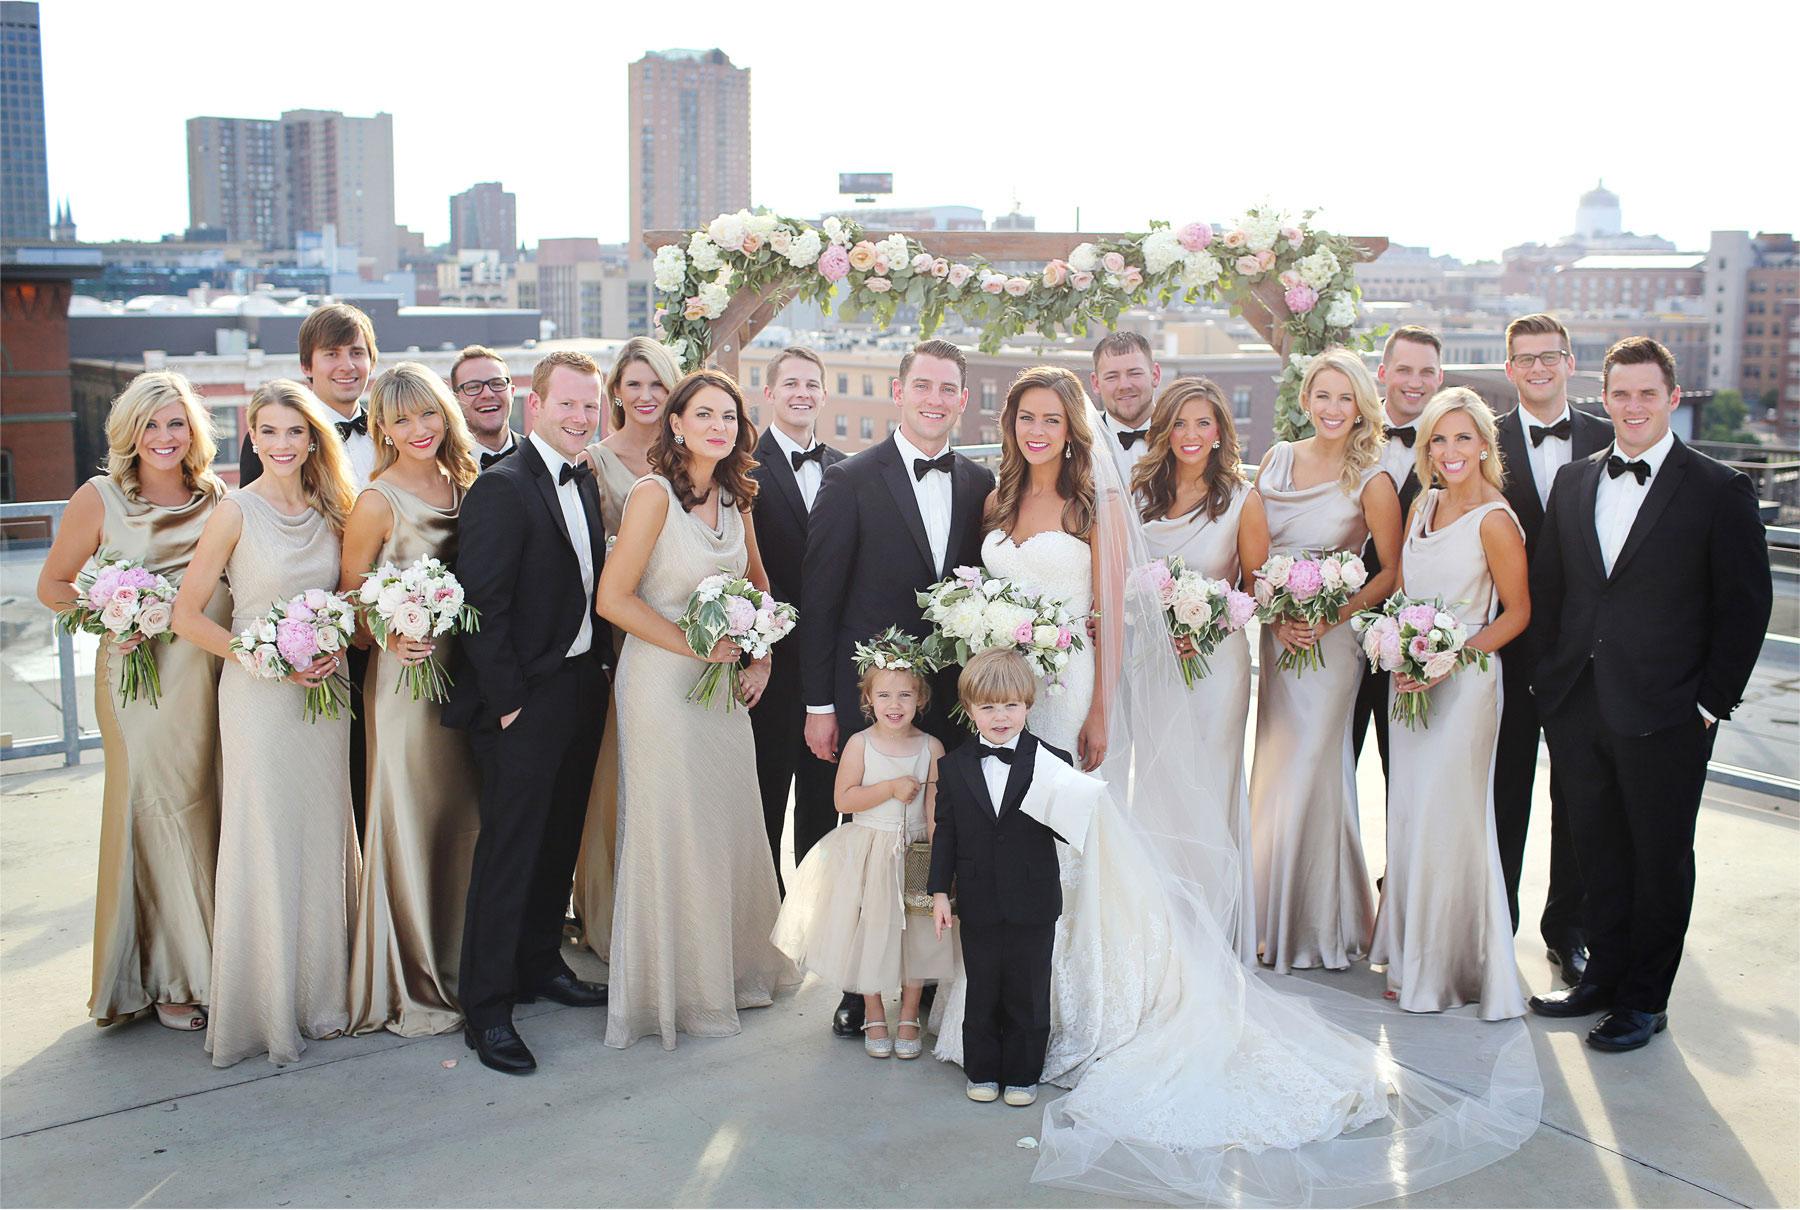 21-Saint-Paul-Minnesota-Wedding-Photographer-by-Andrew-Vick-Photography-Summer-Abulae-Bride-Groom-Bridal-Party-Bridesmaids-Groomsmen-Flower-Girl-Ring-Bearer-Molly-and-Dan.jpg